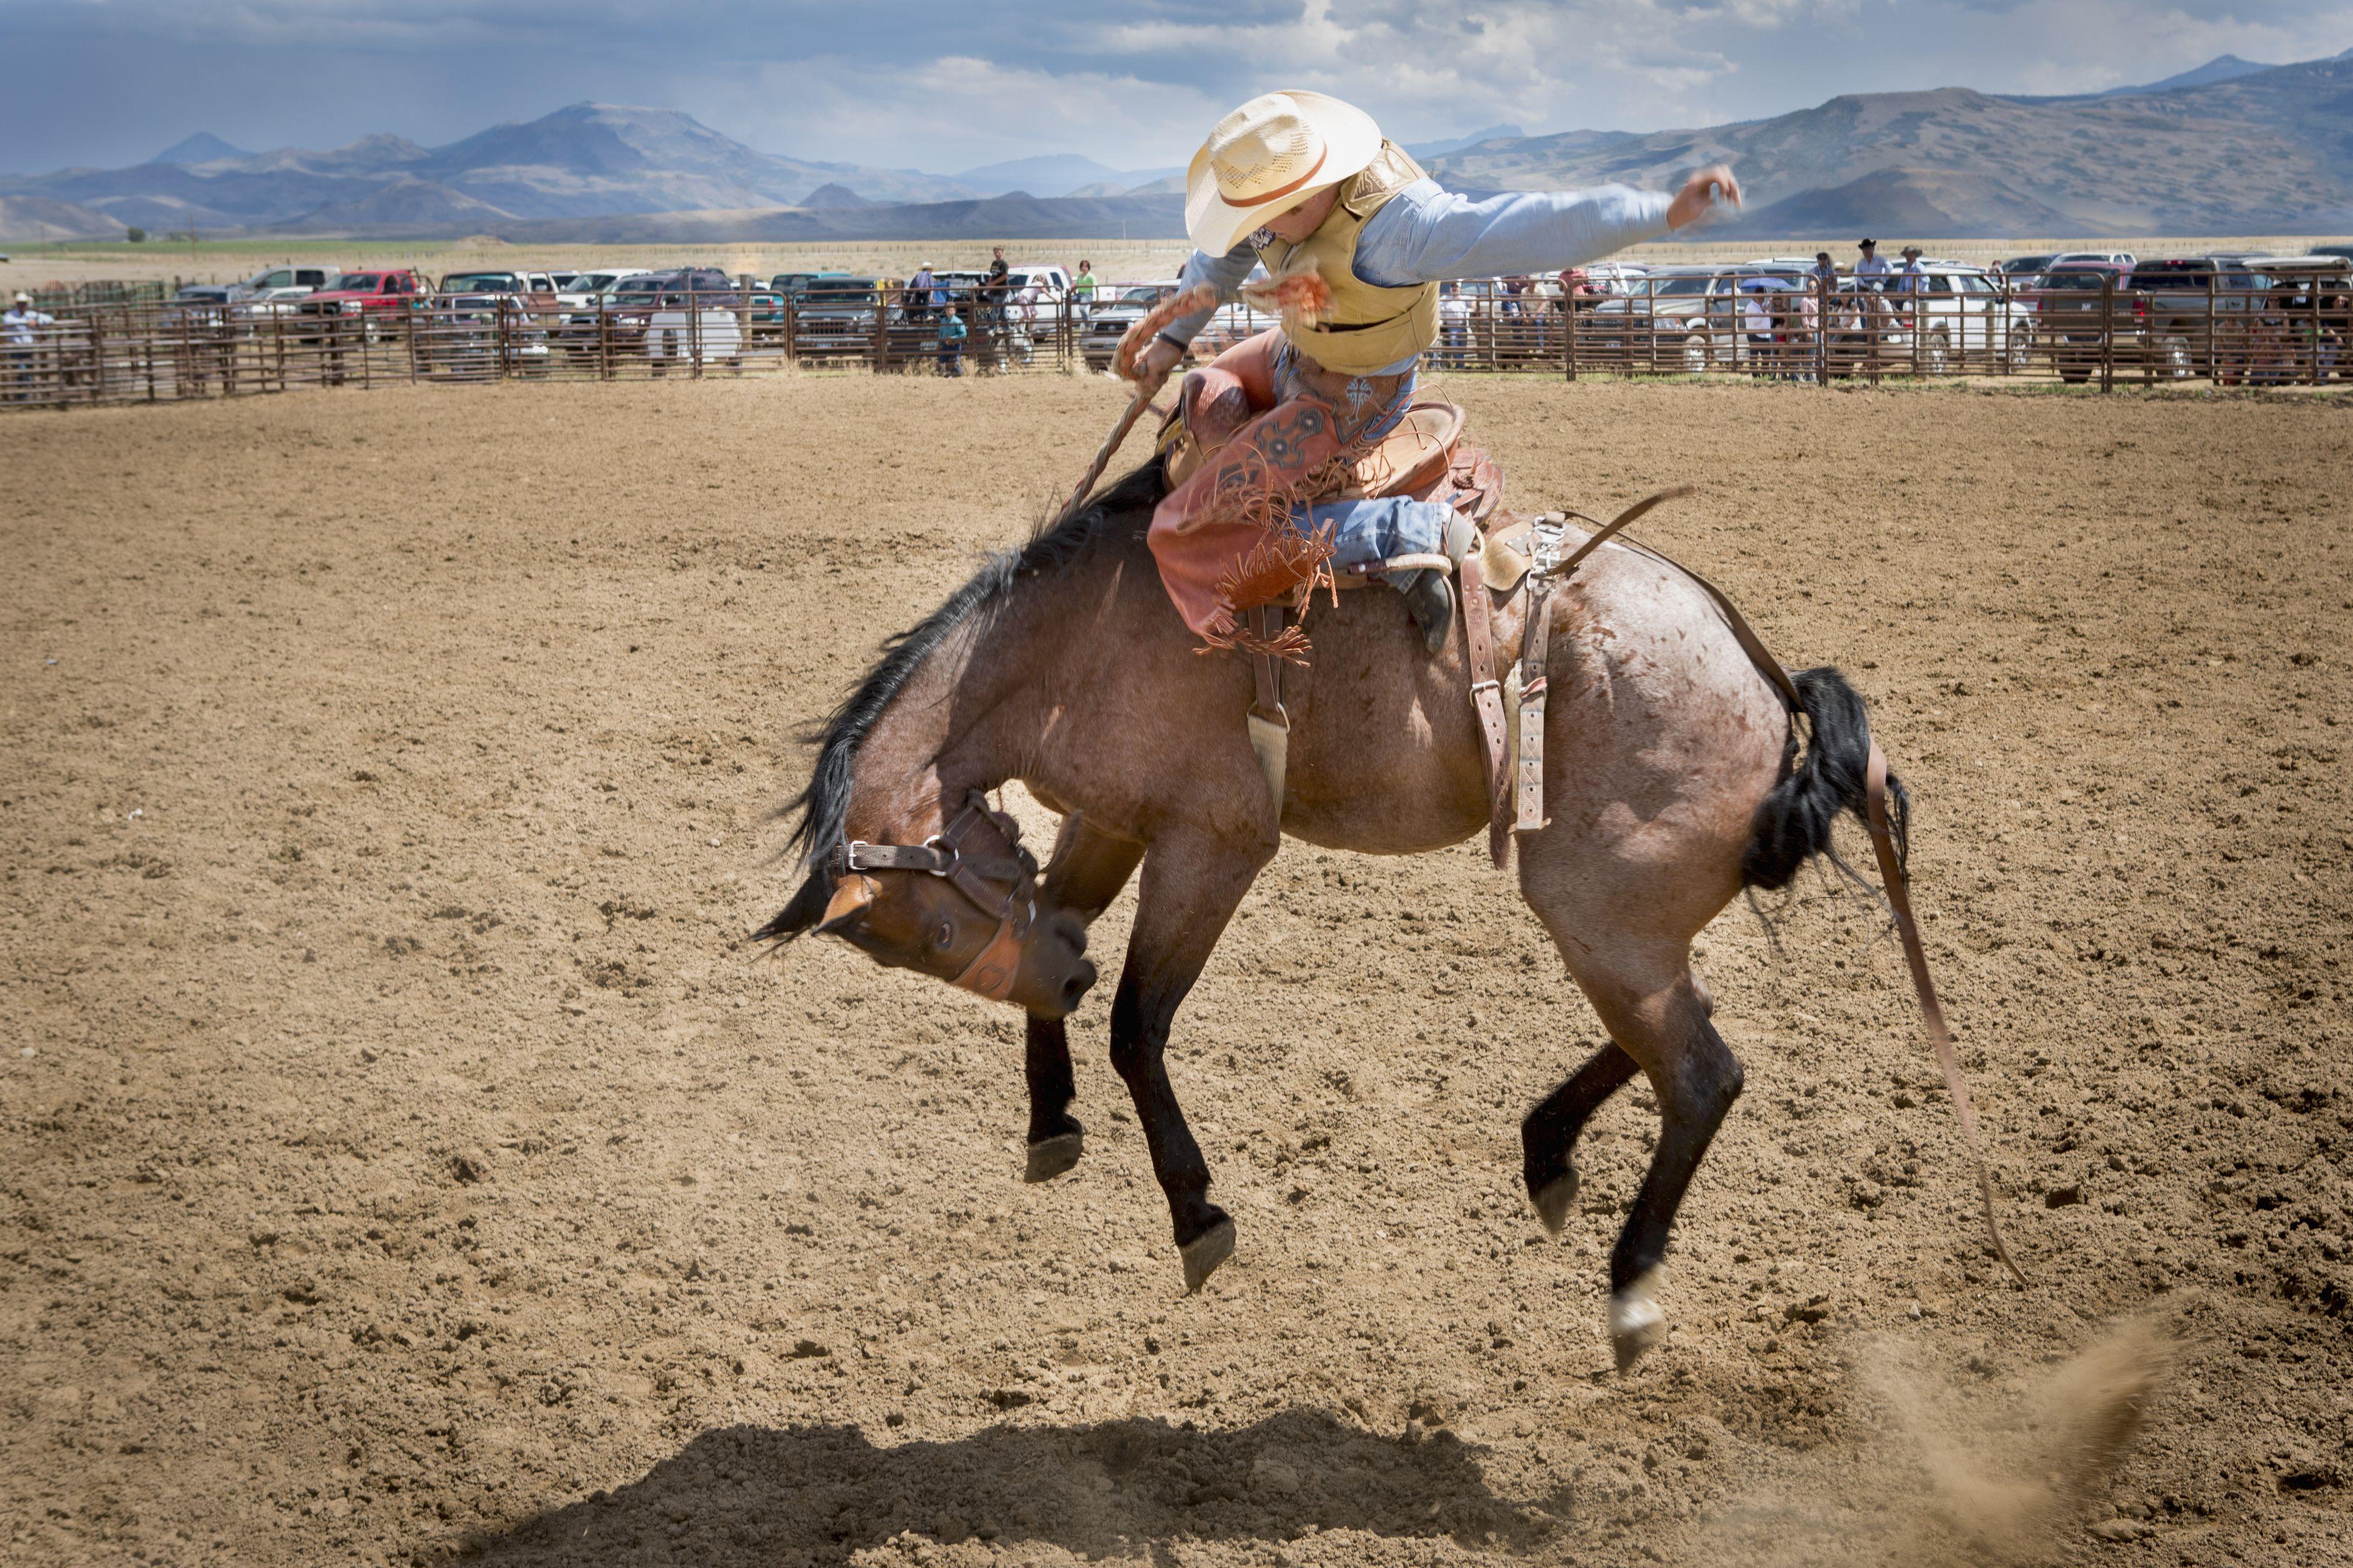 A cowboy rides a bucking horse